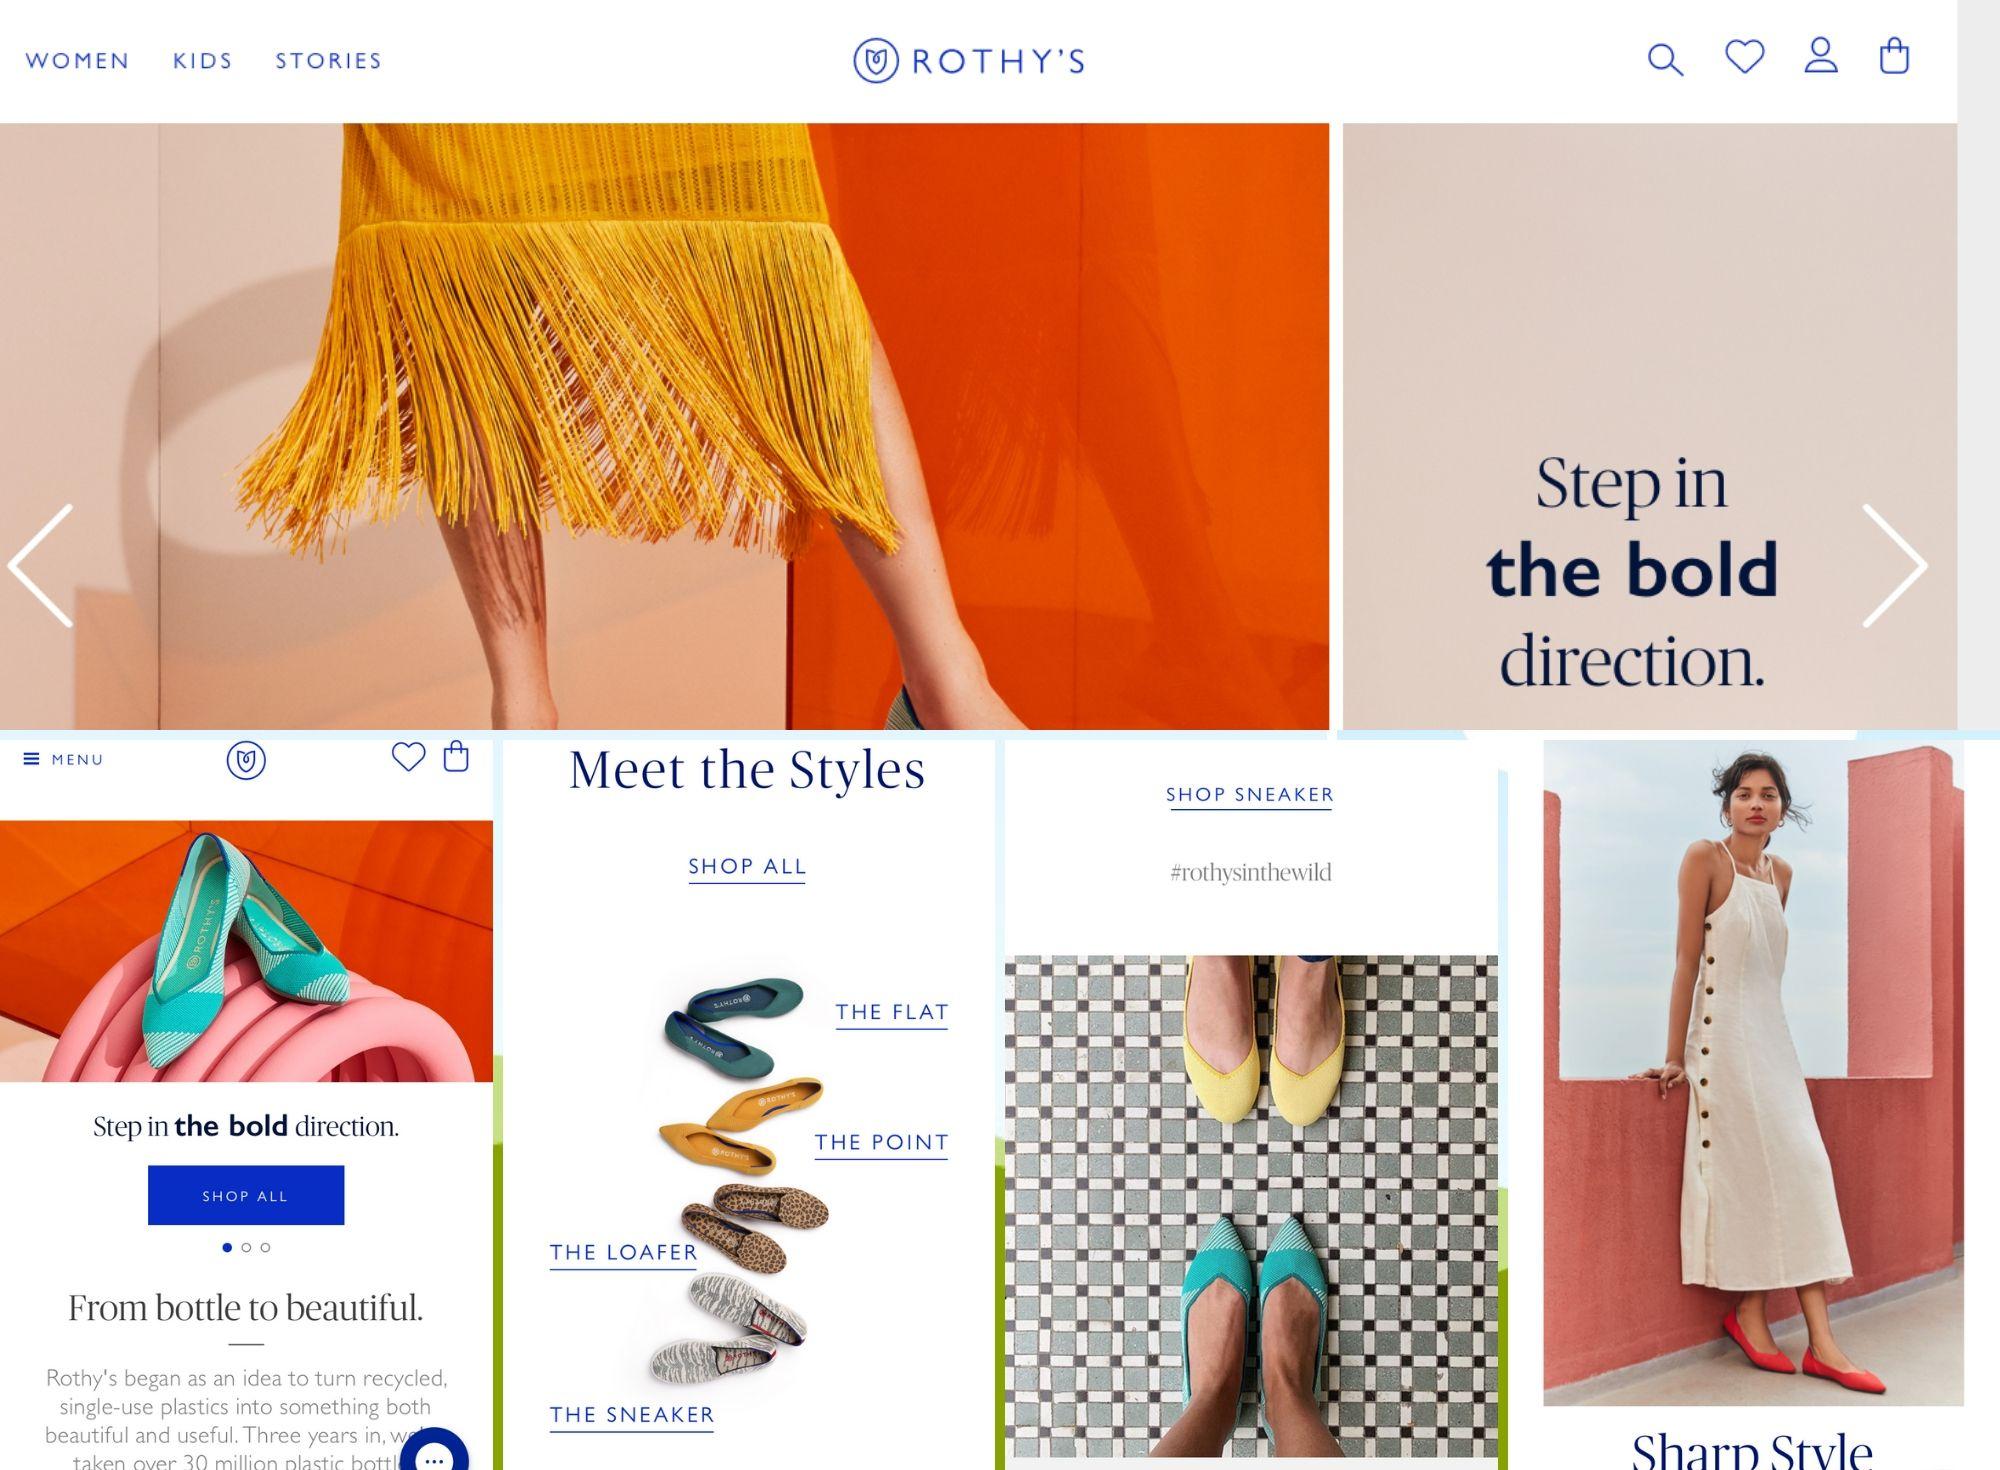 Rothys.com Example of Mobile & Desktop image Optimization